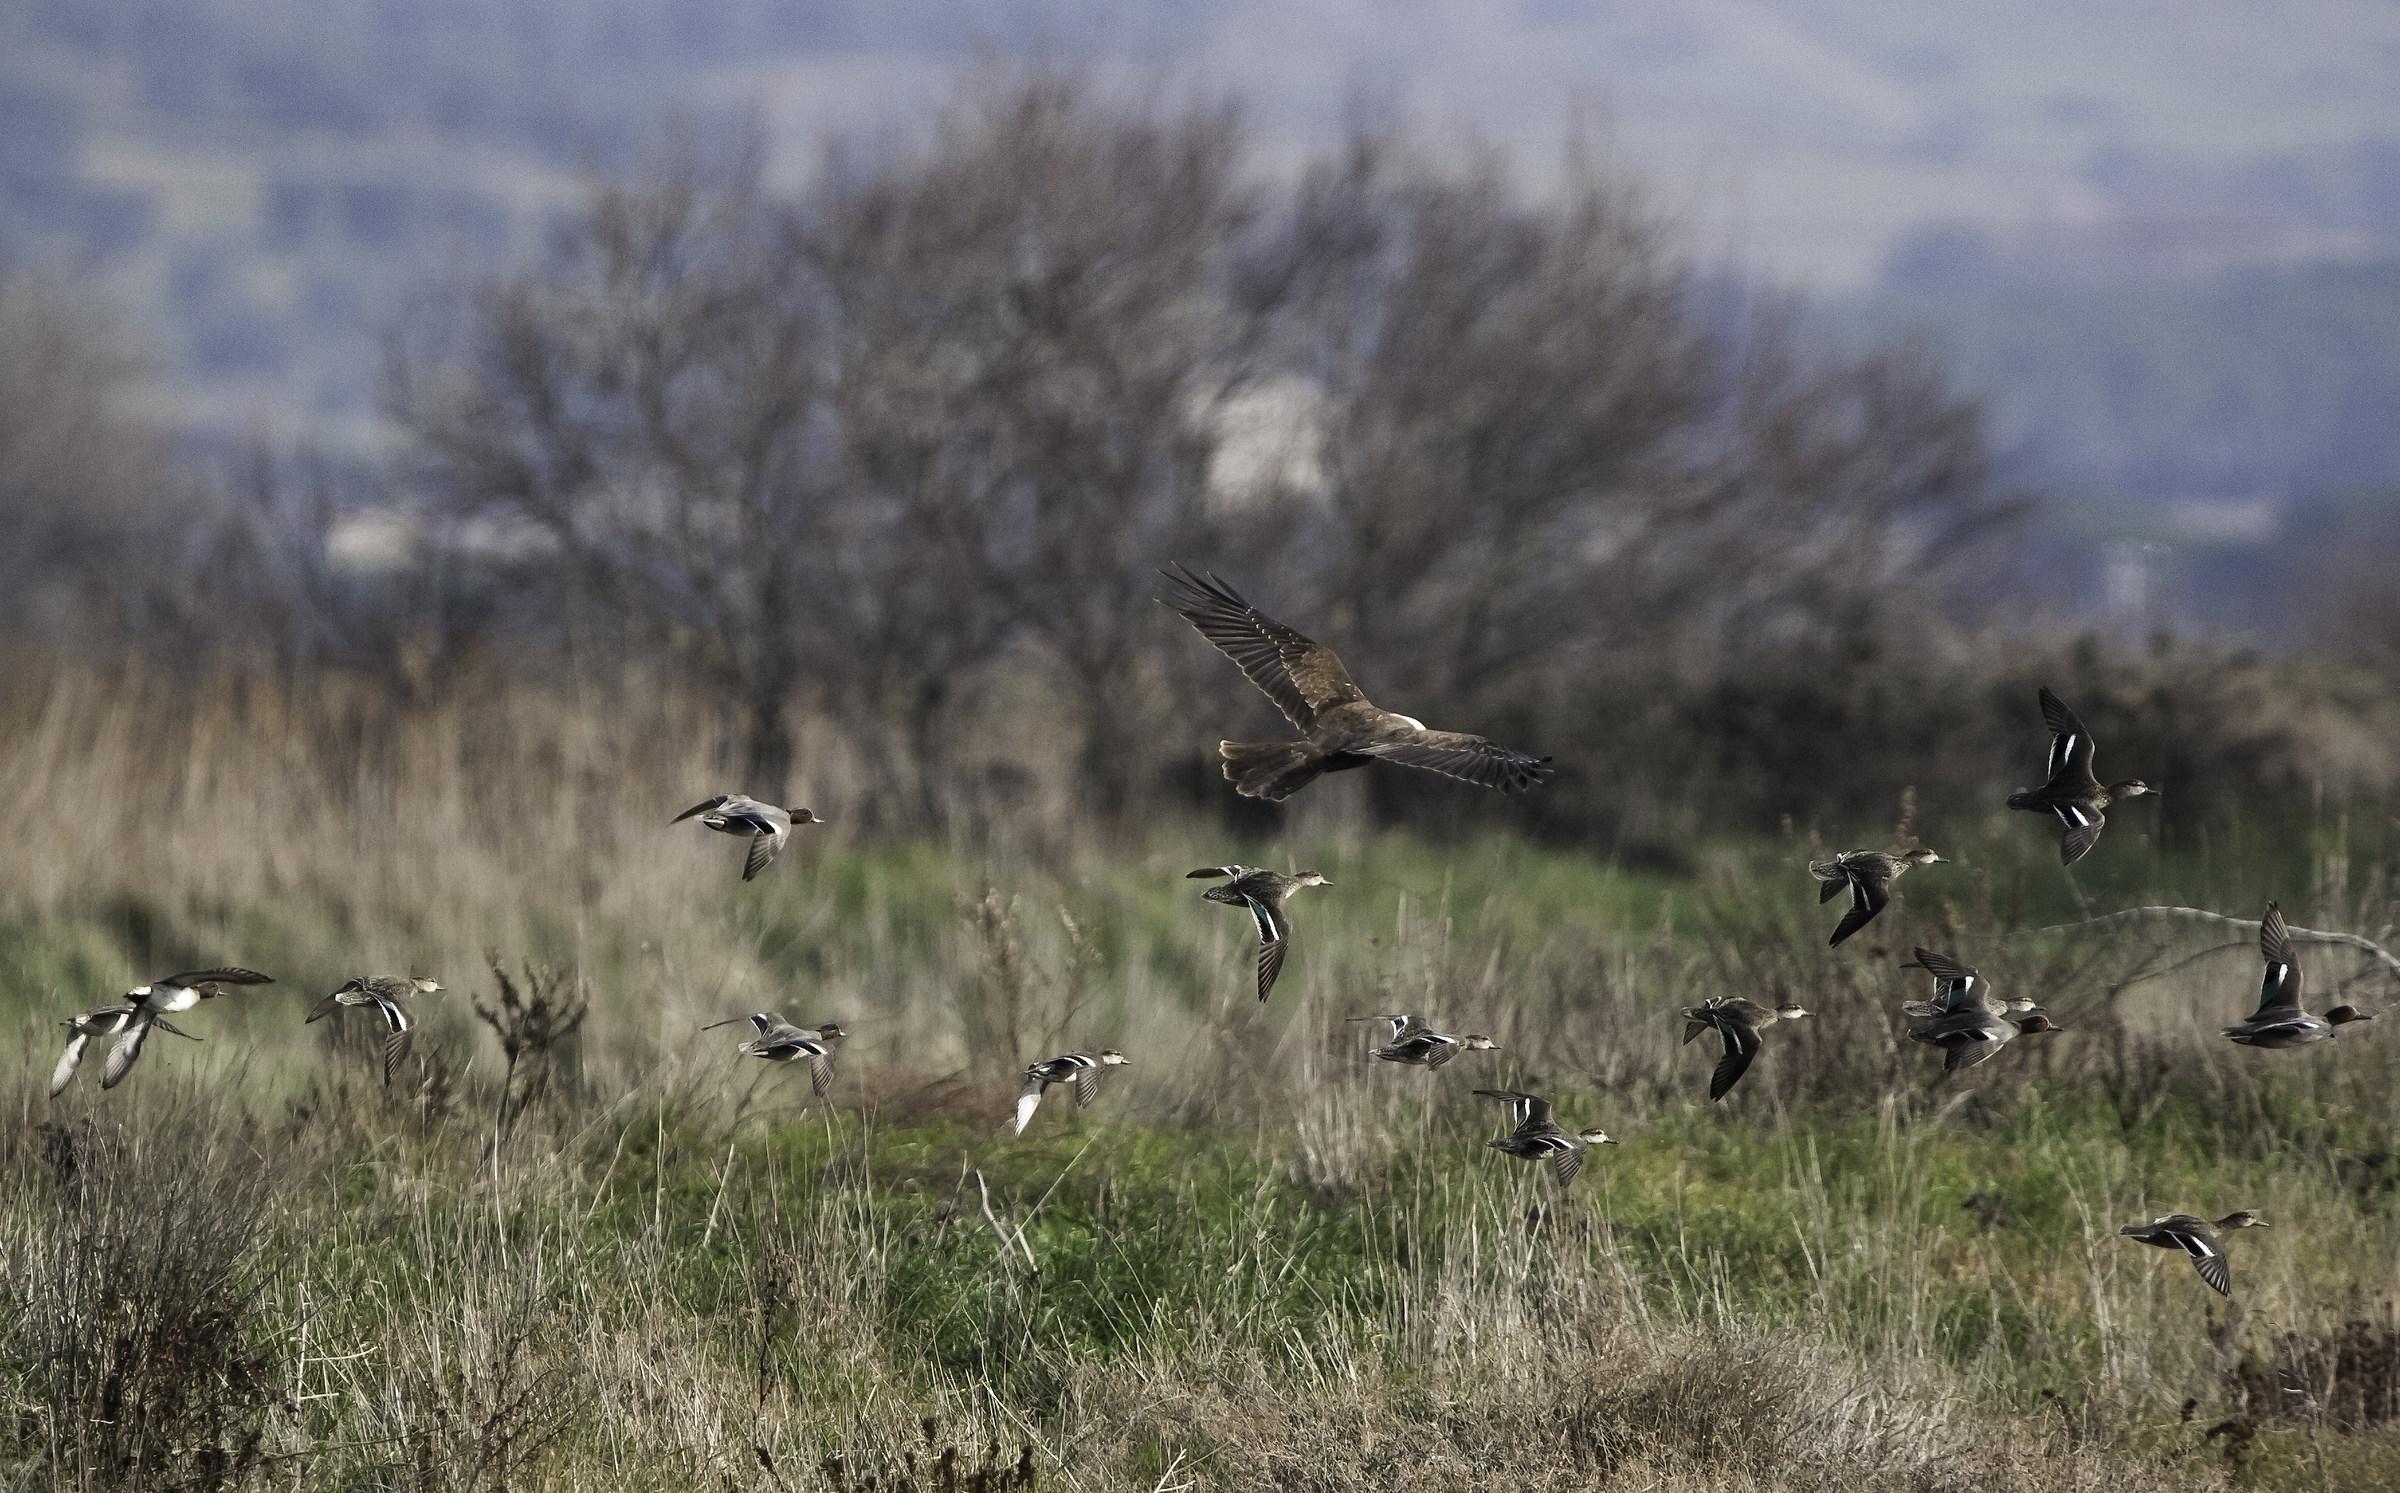 Falco di palude femmina in caccia...